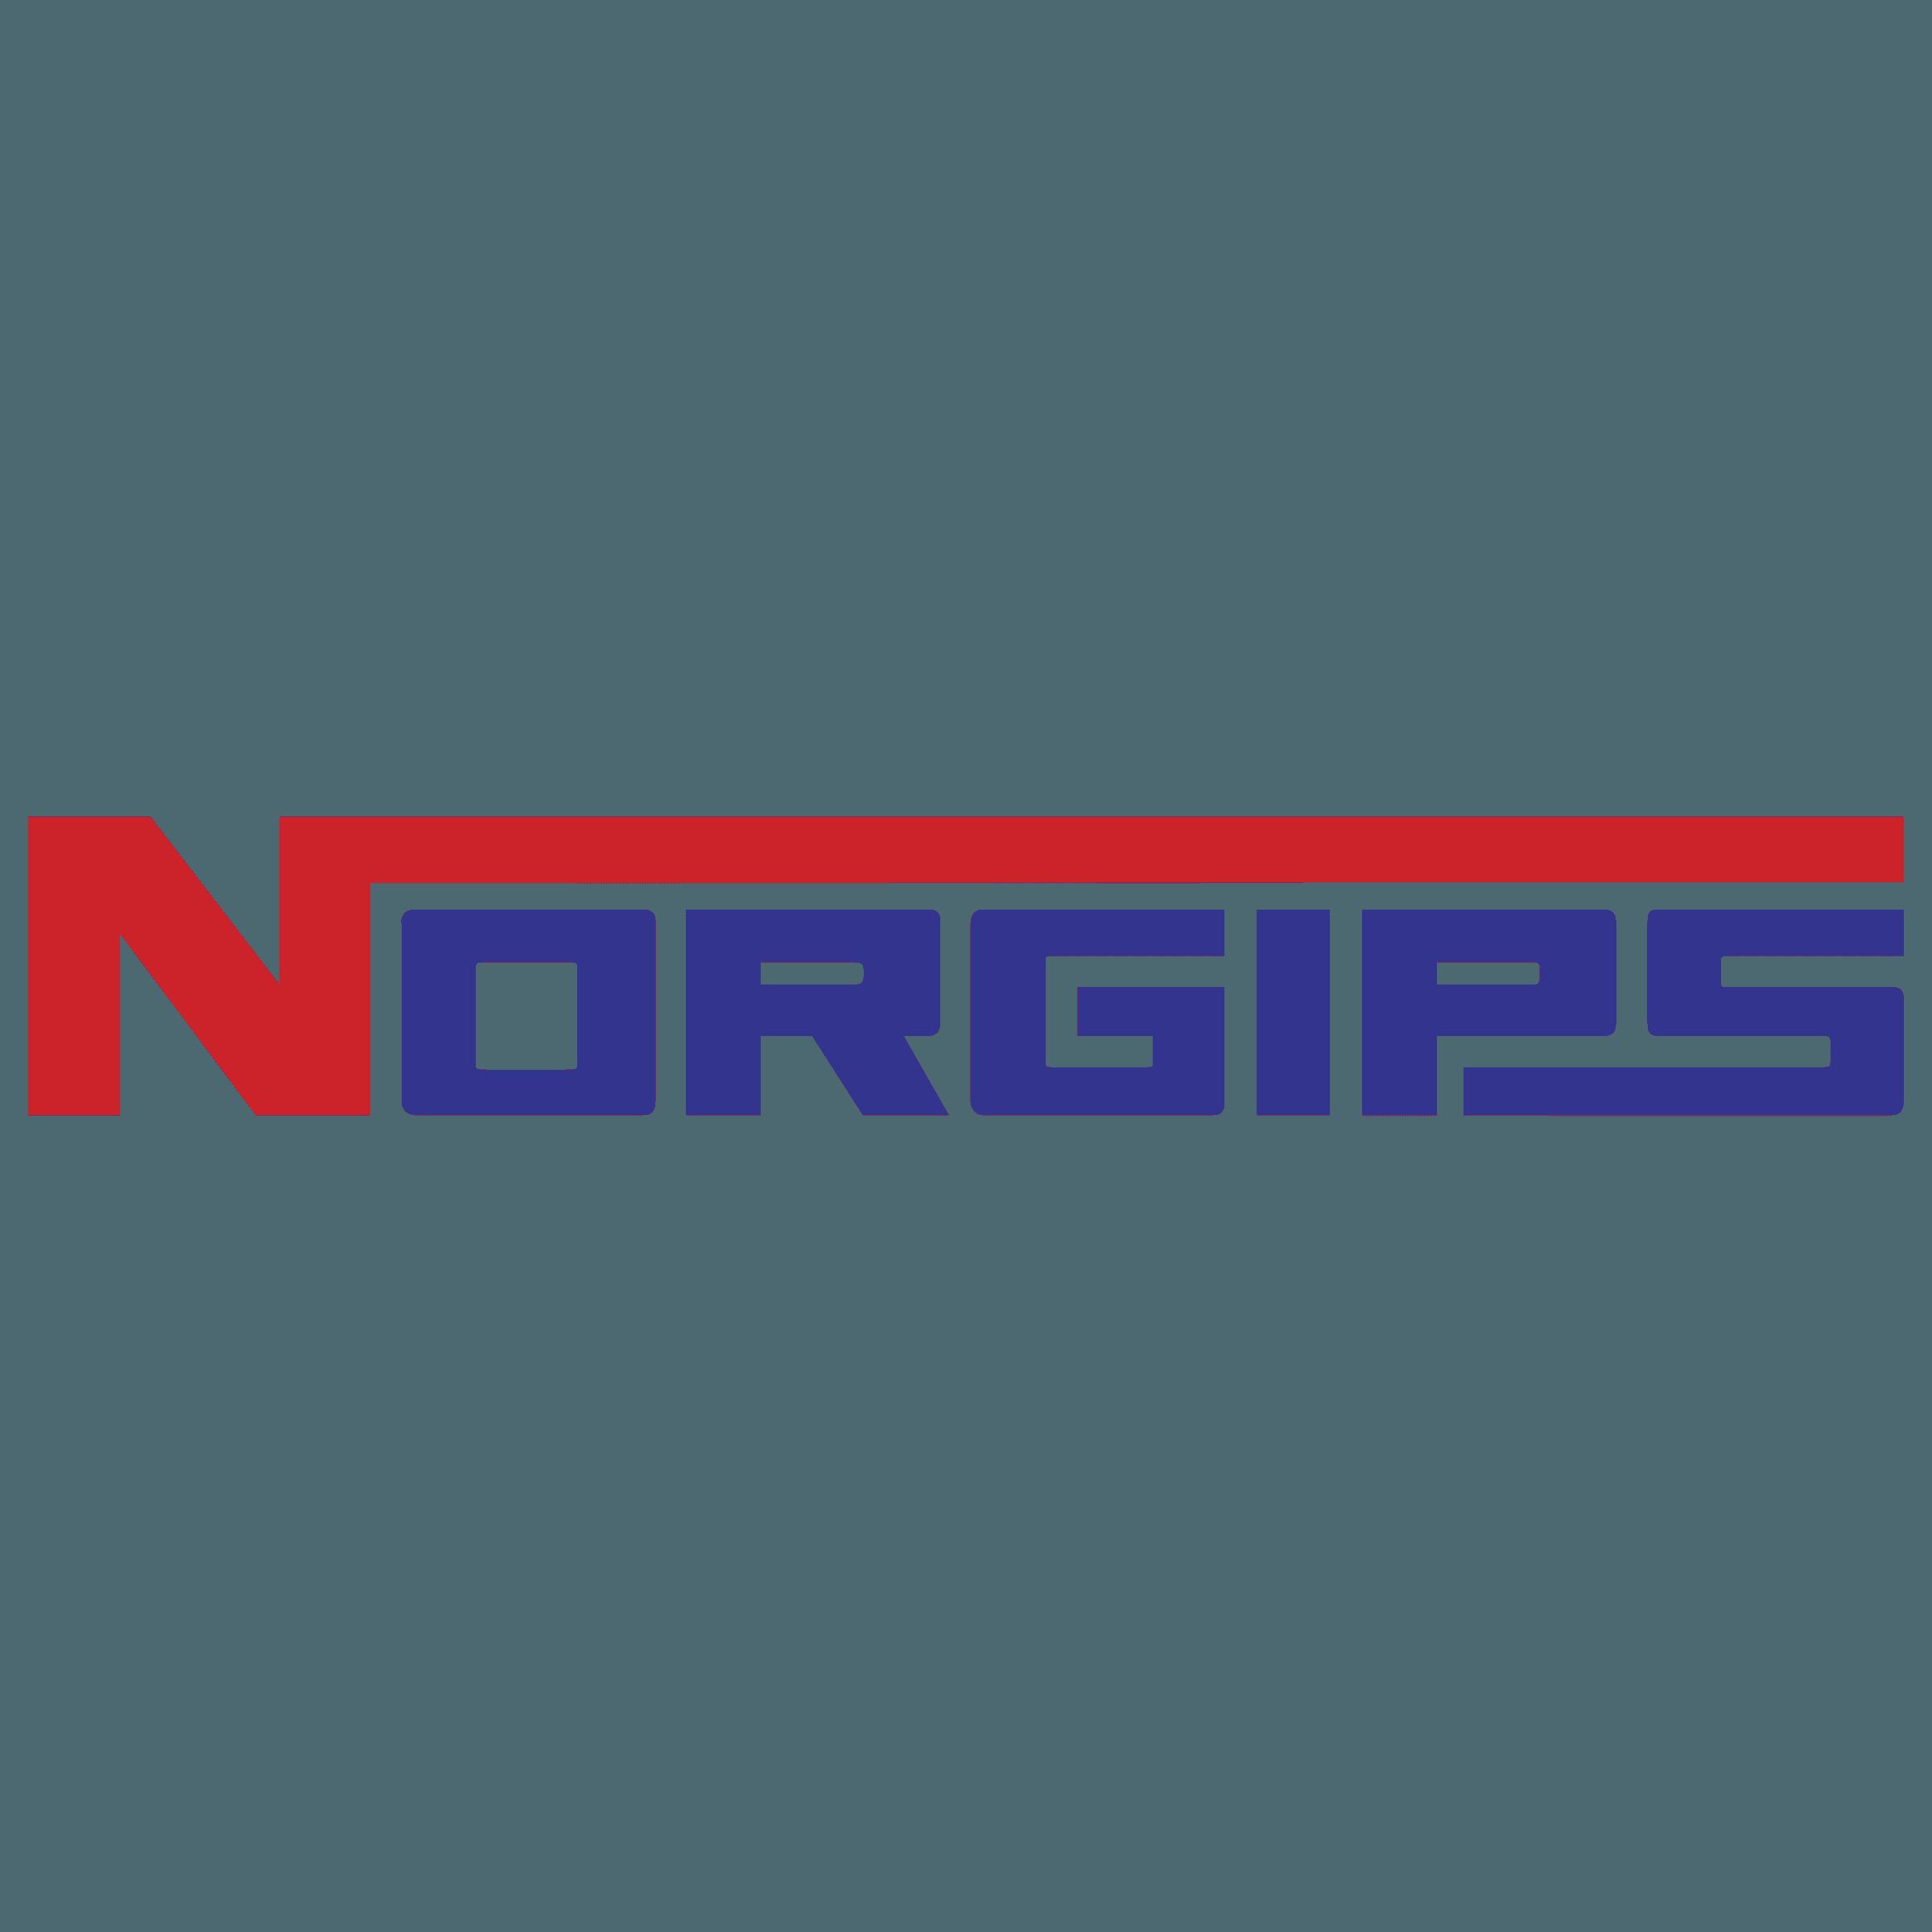 norgips-1-logo-png-transparent